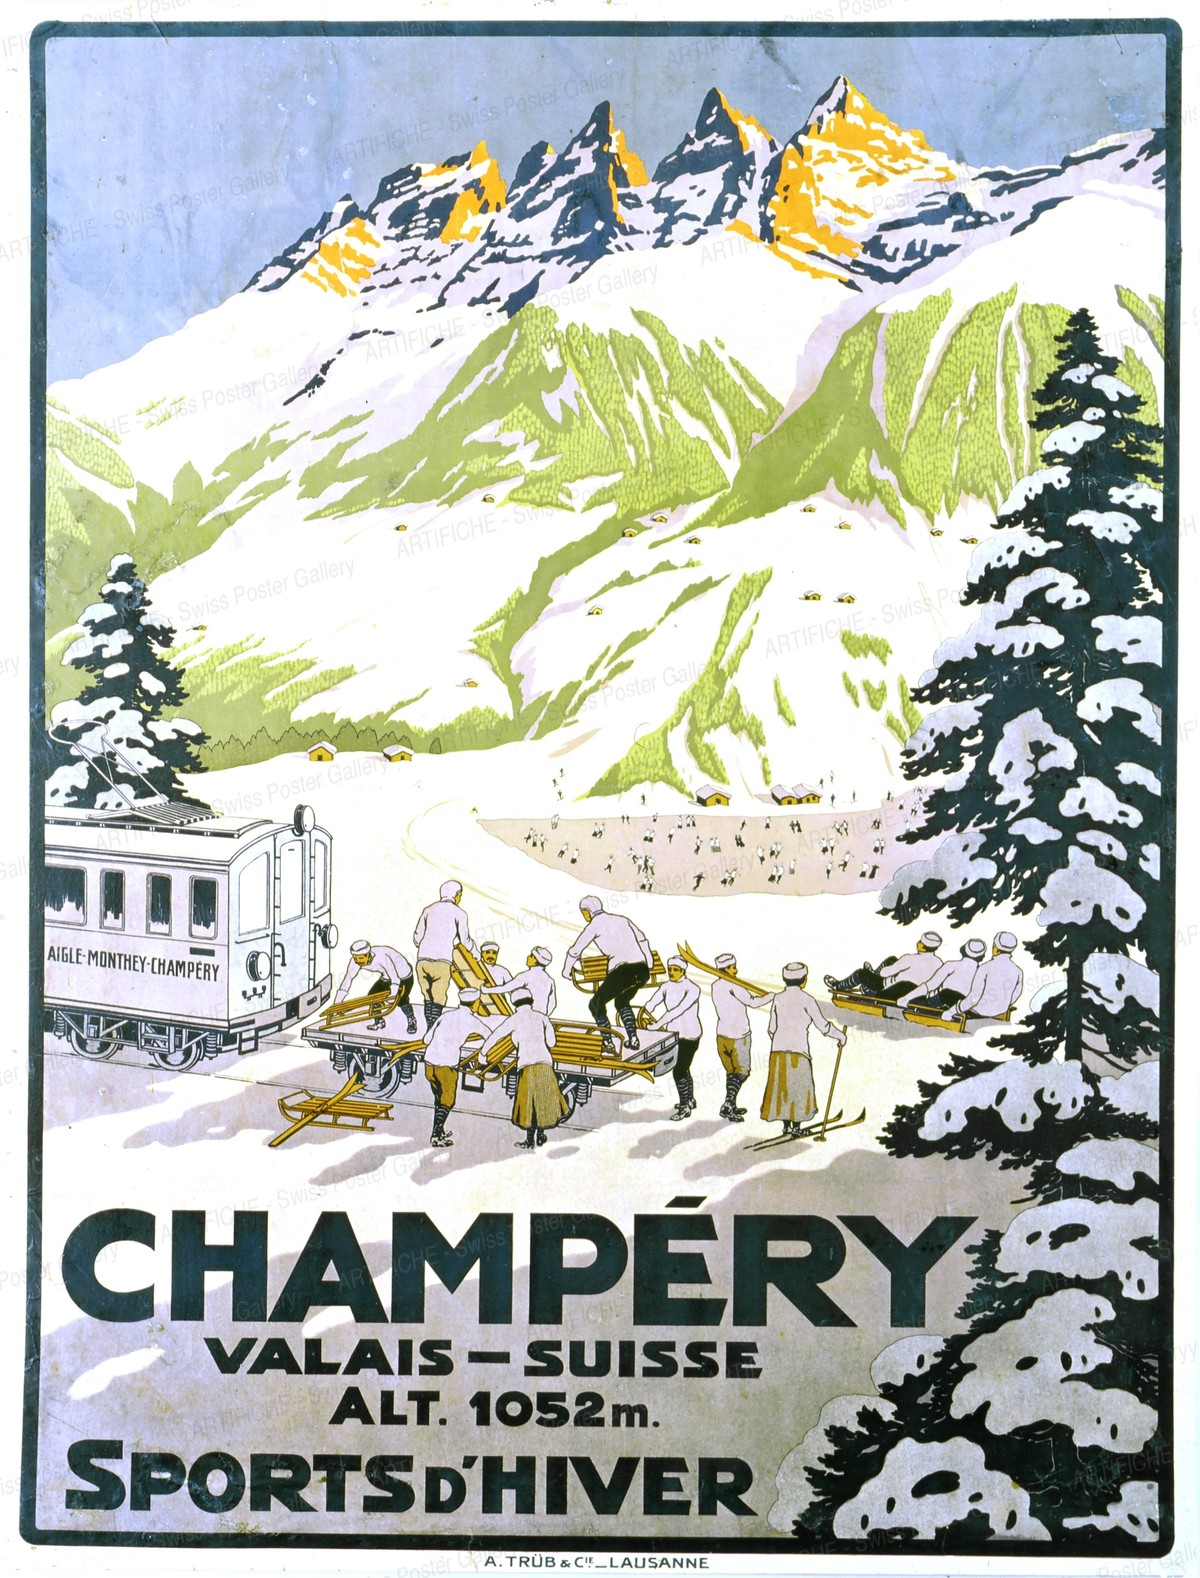 CHAMPÉRY – Valais – Sports d'hiver, Artist unknown